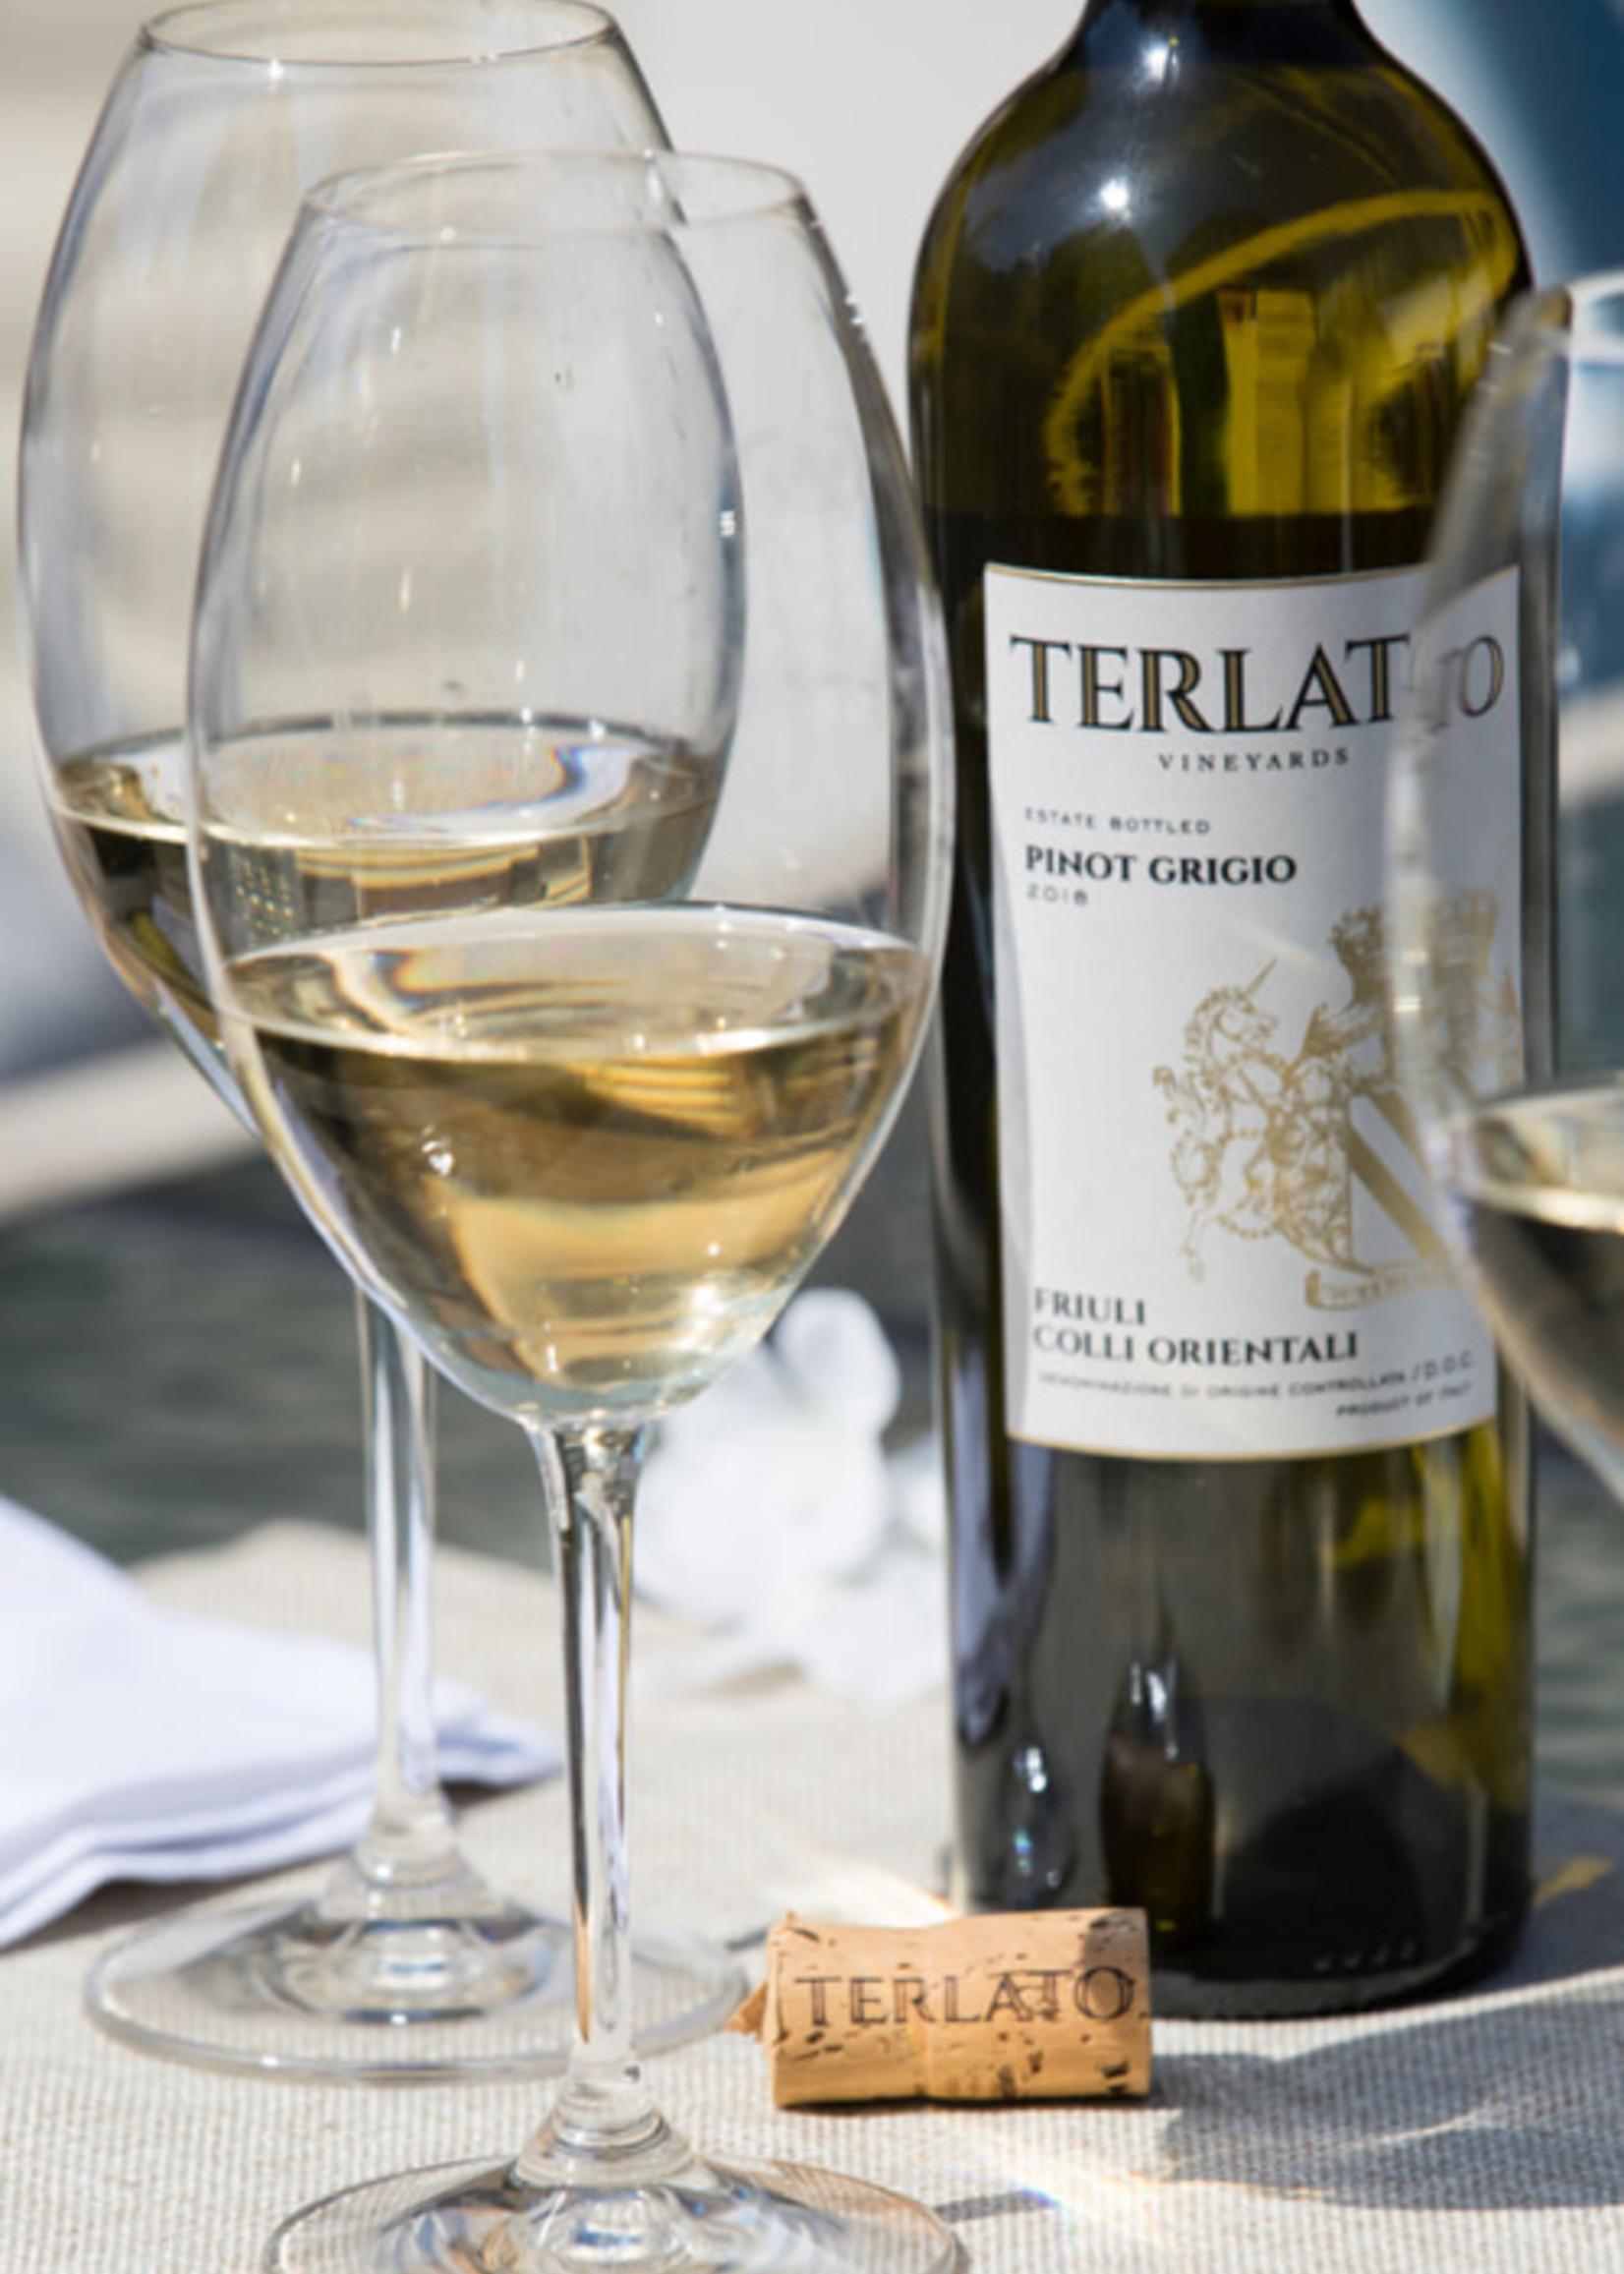 Terlato Pinot Grigio